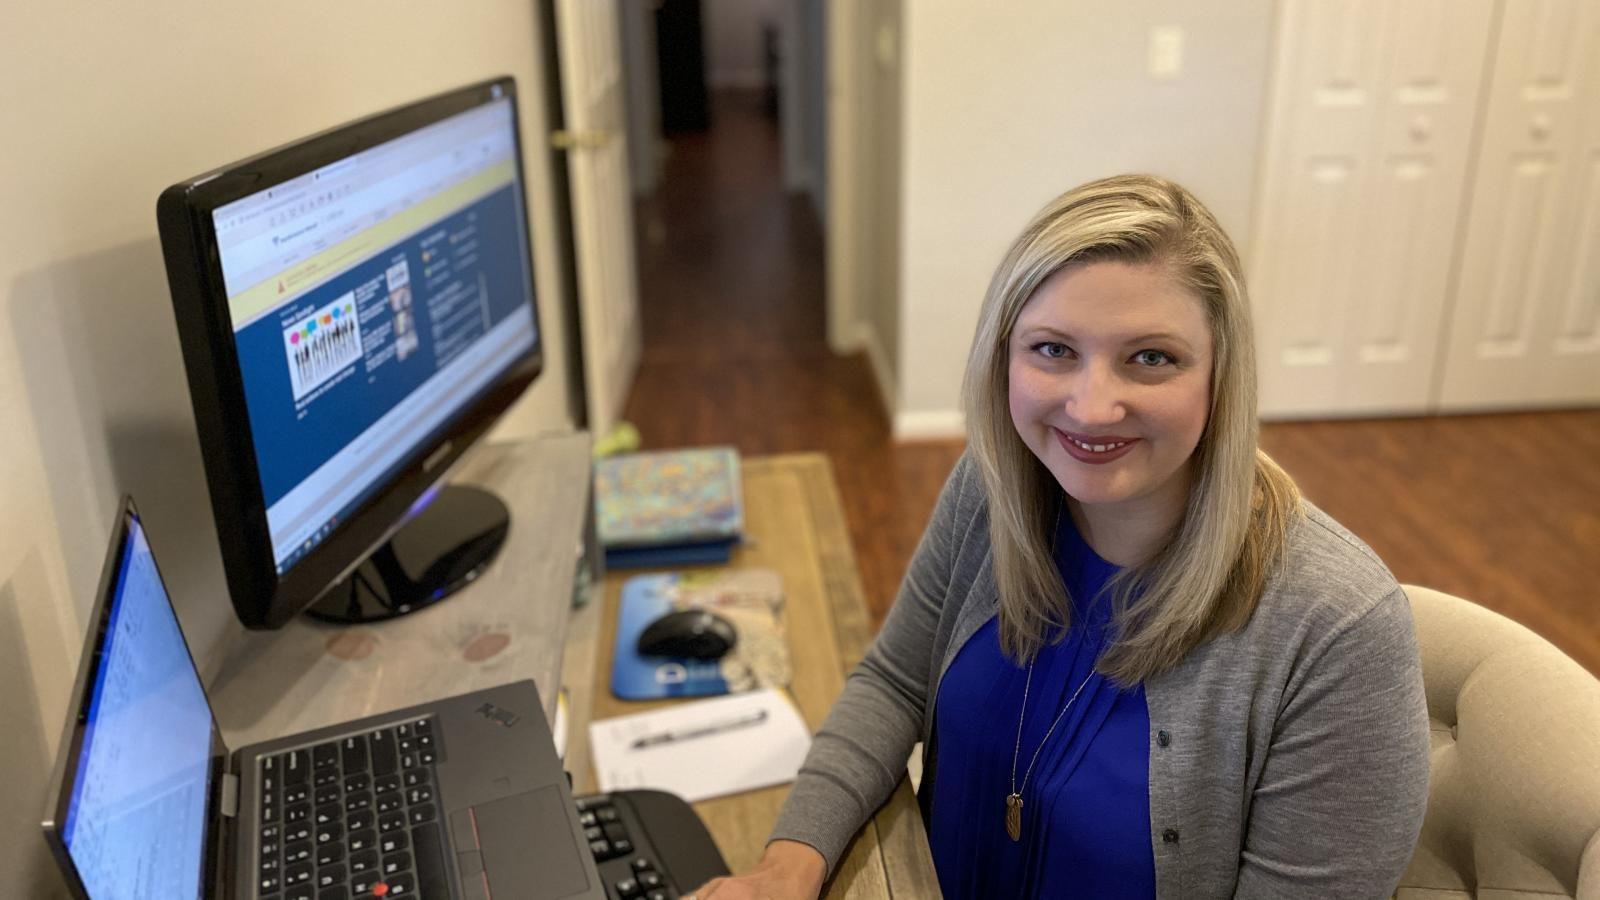 Northwestern Mutual financial advisor Marie O'Keefe